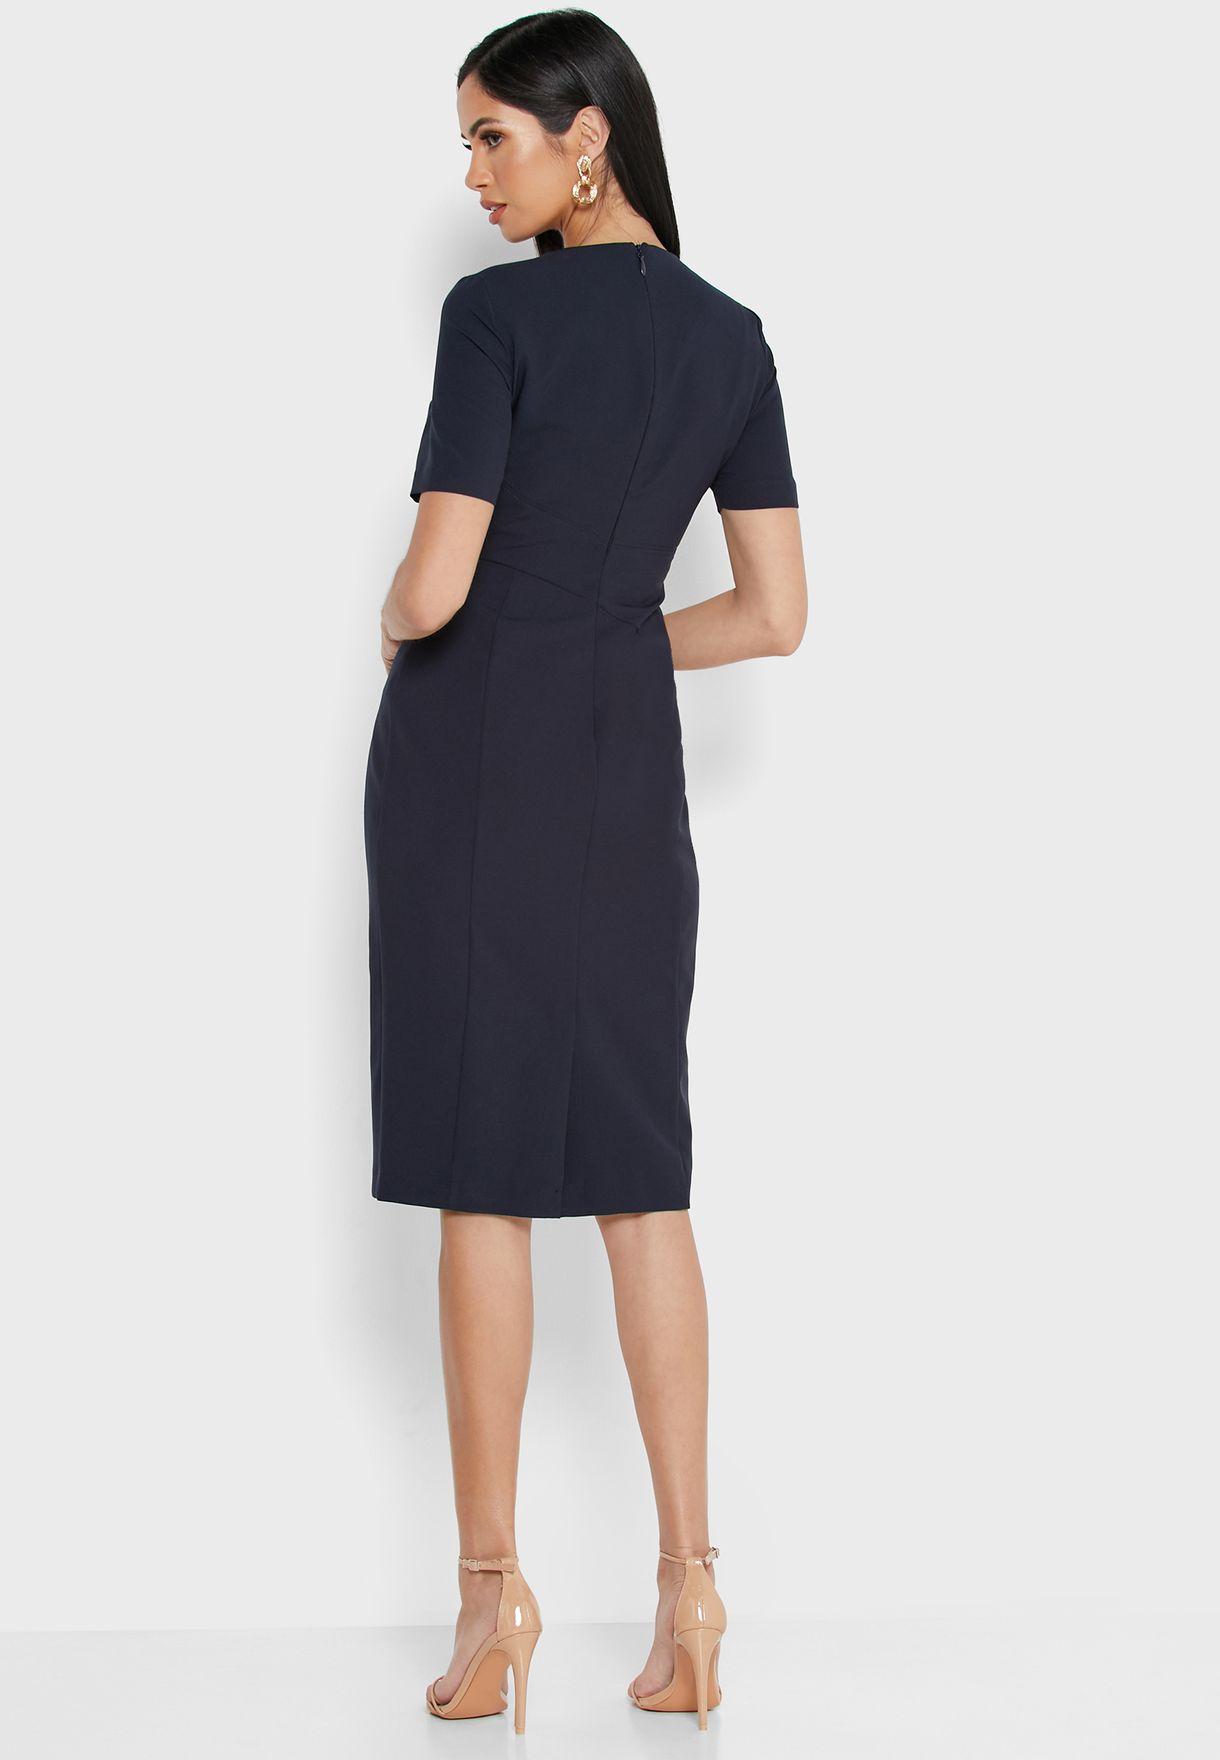 Back Zip Through Dress